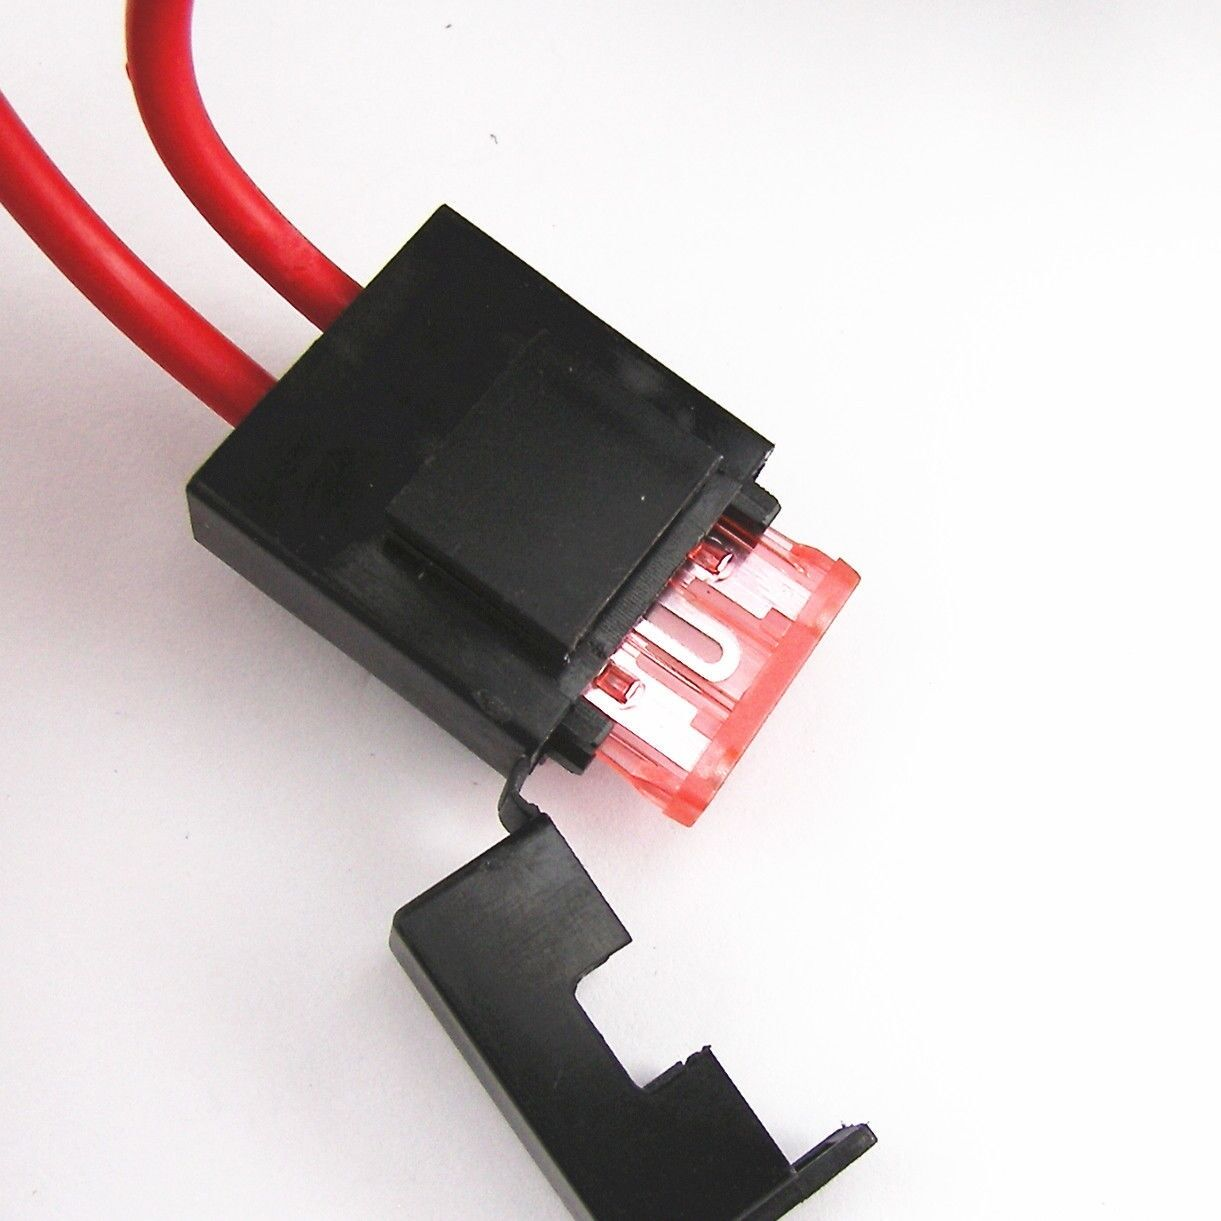 4 Headlight Relay Wire Harness H4 9003 Light Bulb Ceramic Socket Hb2 Wiring Diagram F250 Plugs Dodge Ram Ebay